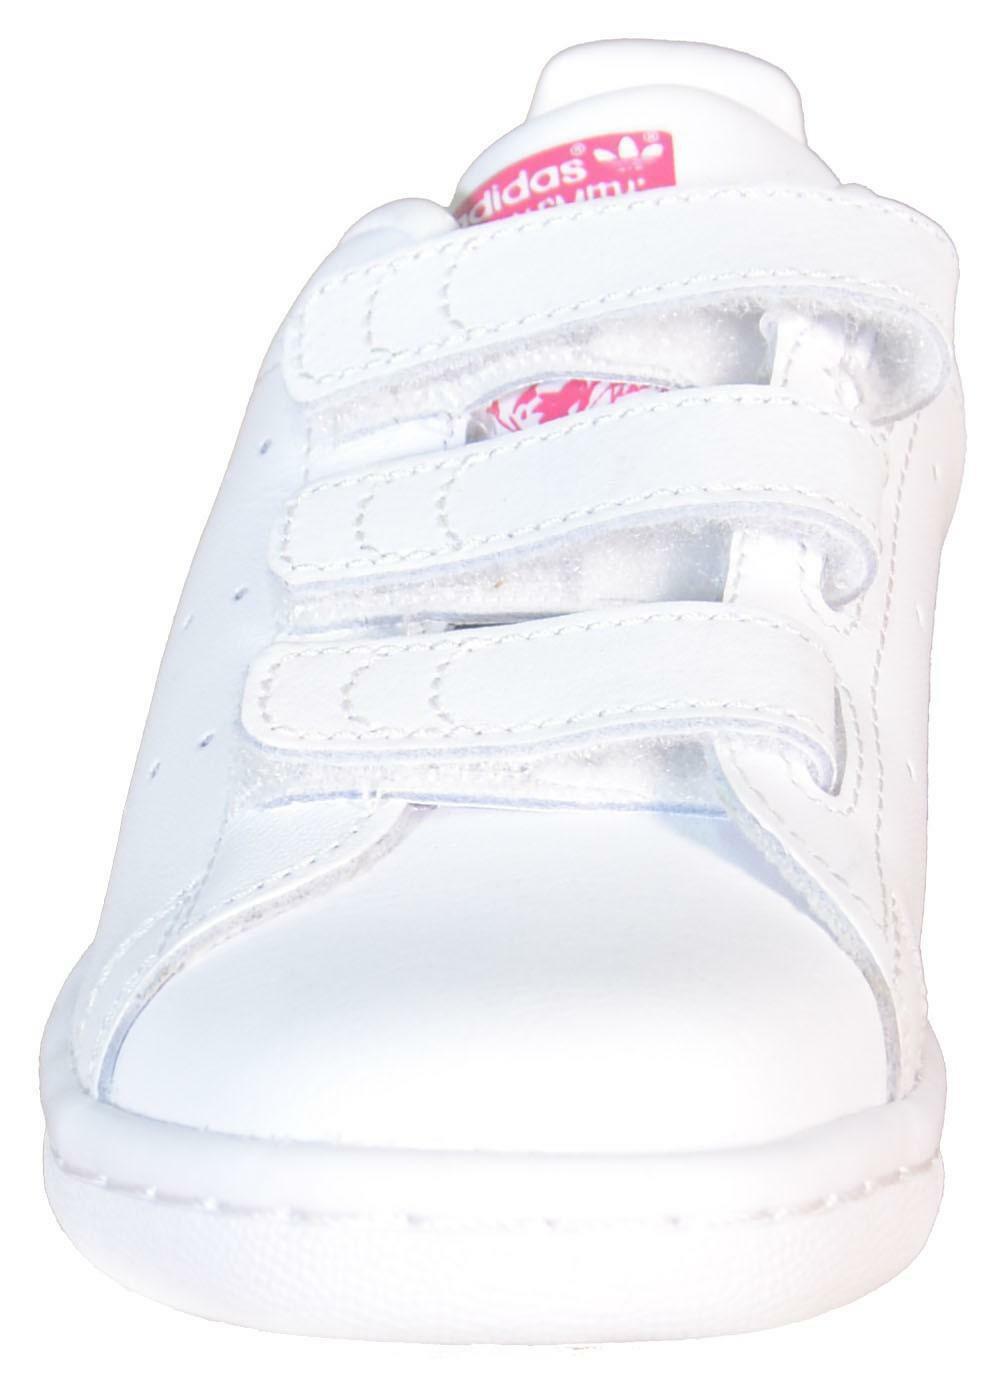 adidas stan smith cf c scarpe sportive bambina bianche pelle strappi b32706